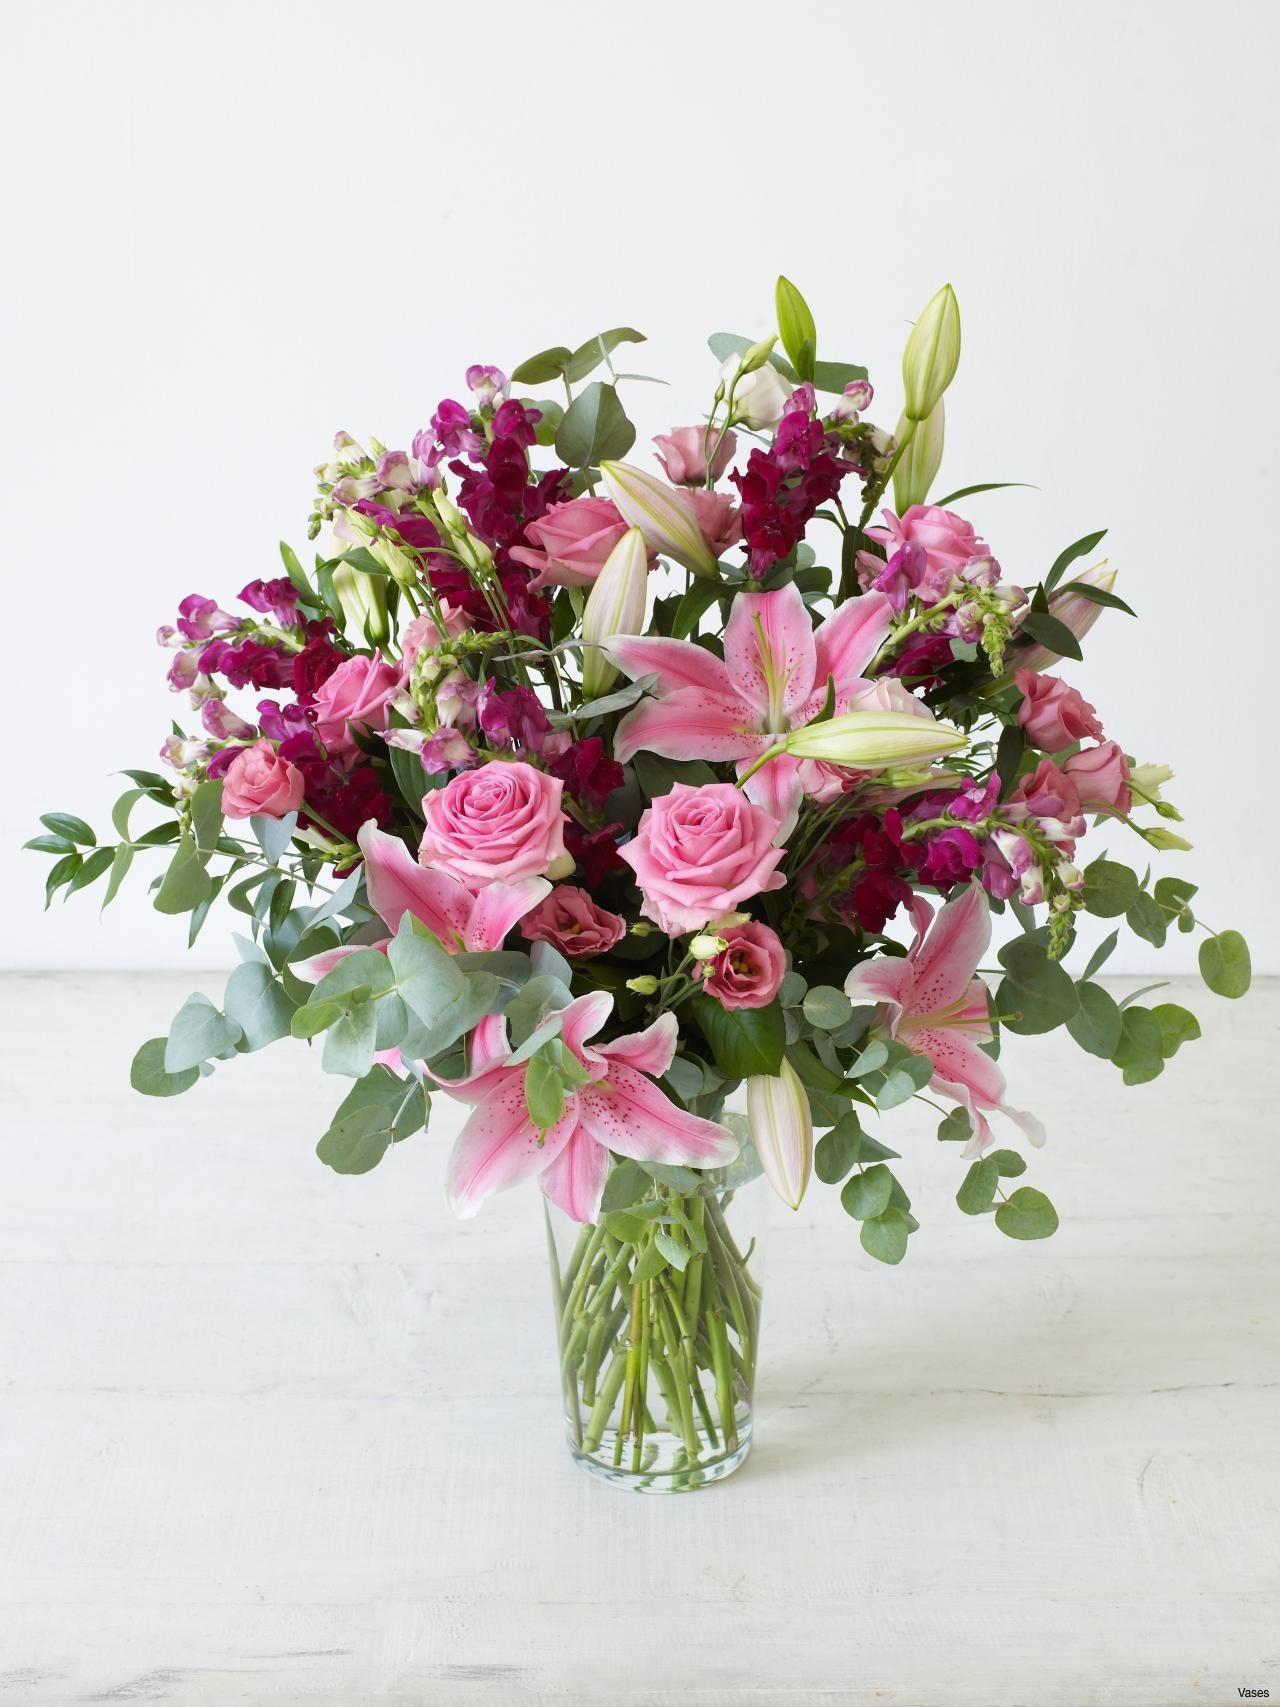 Idee Garten Best Of Best Floss Flower Flower Beautiful Flower Arrangements